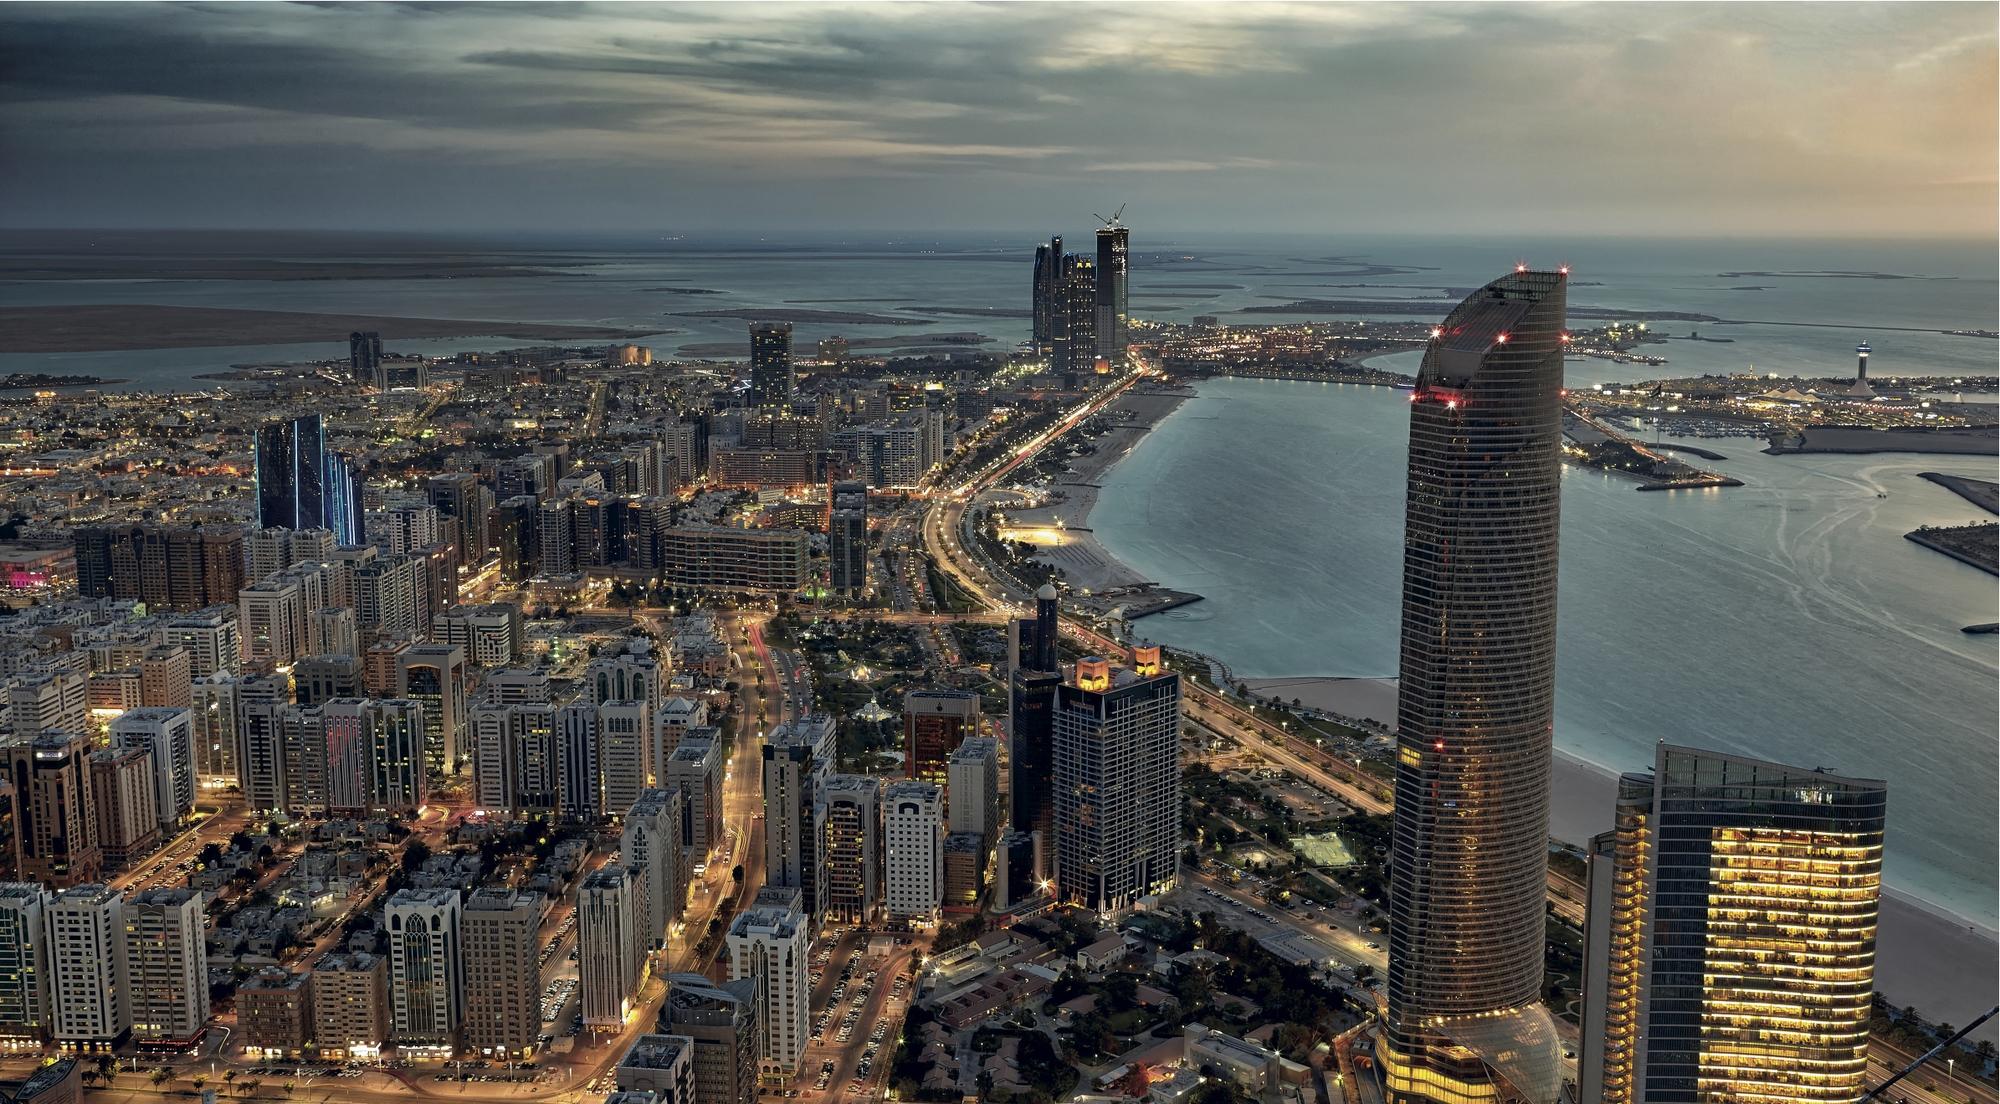 Vista geral de Abu Dhabi